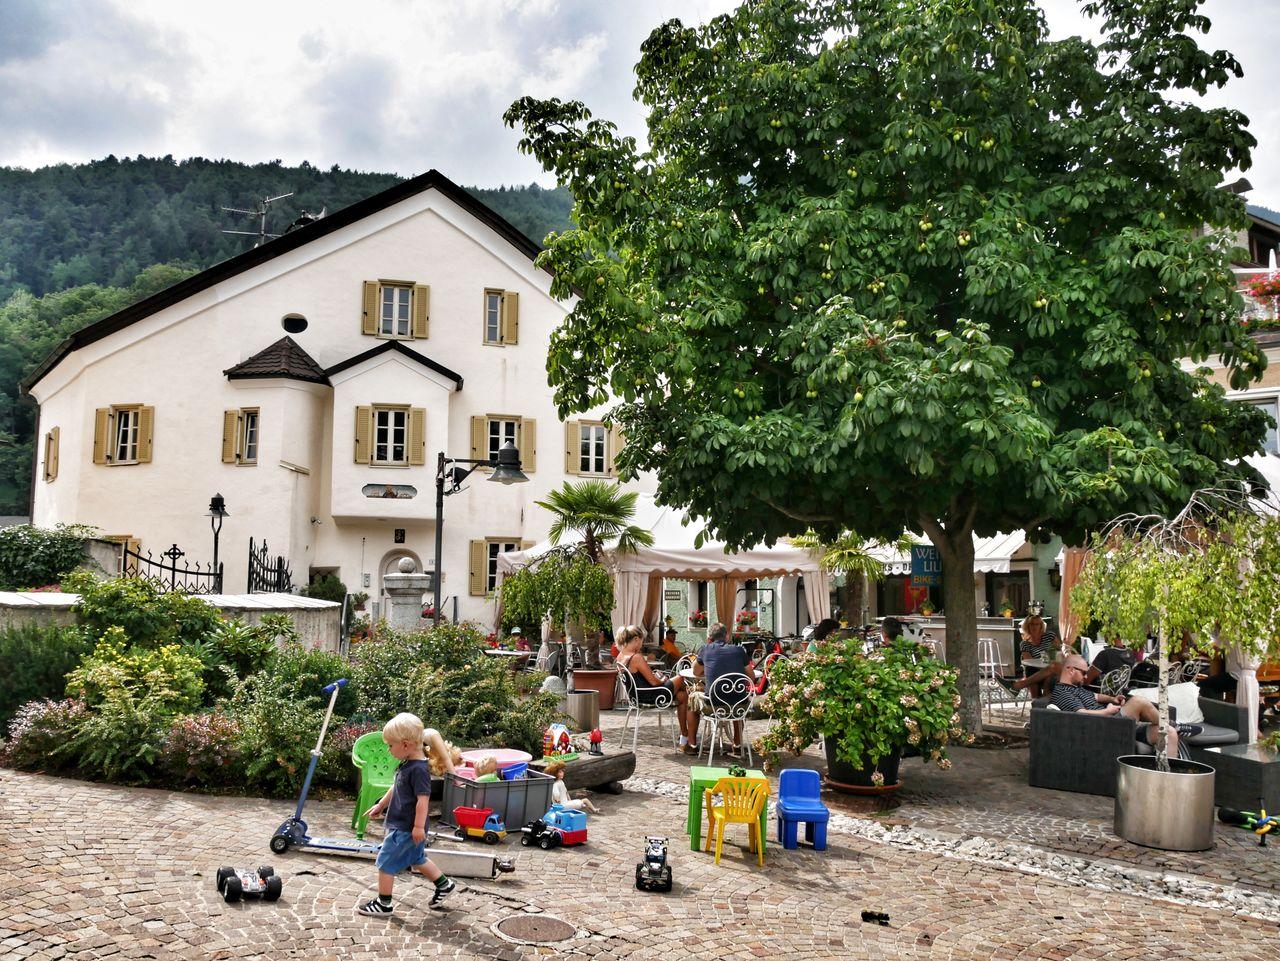 Mühlbach Zuid Tirol plein